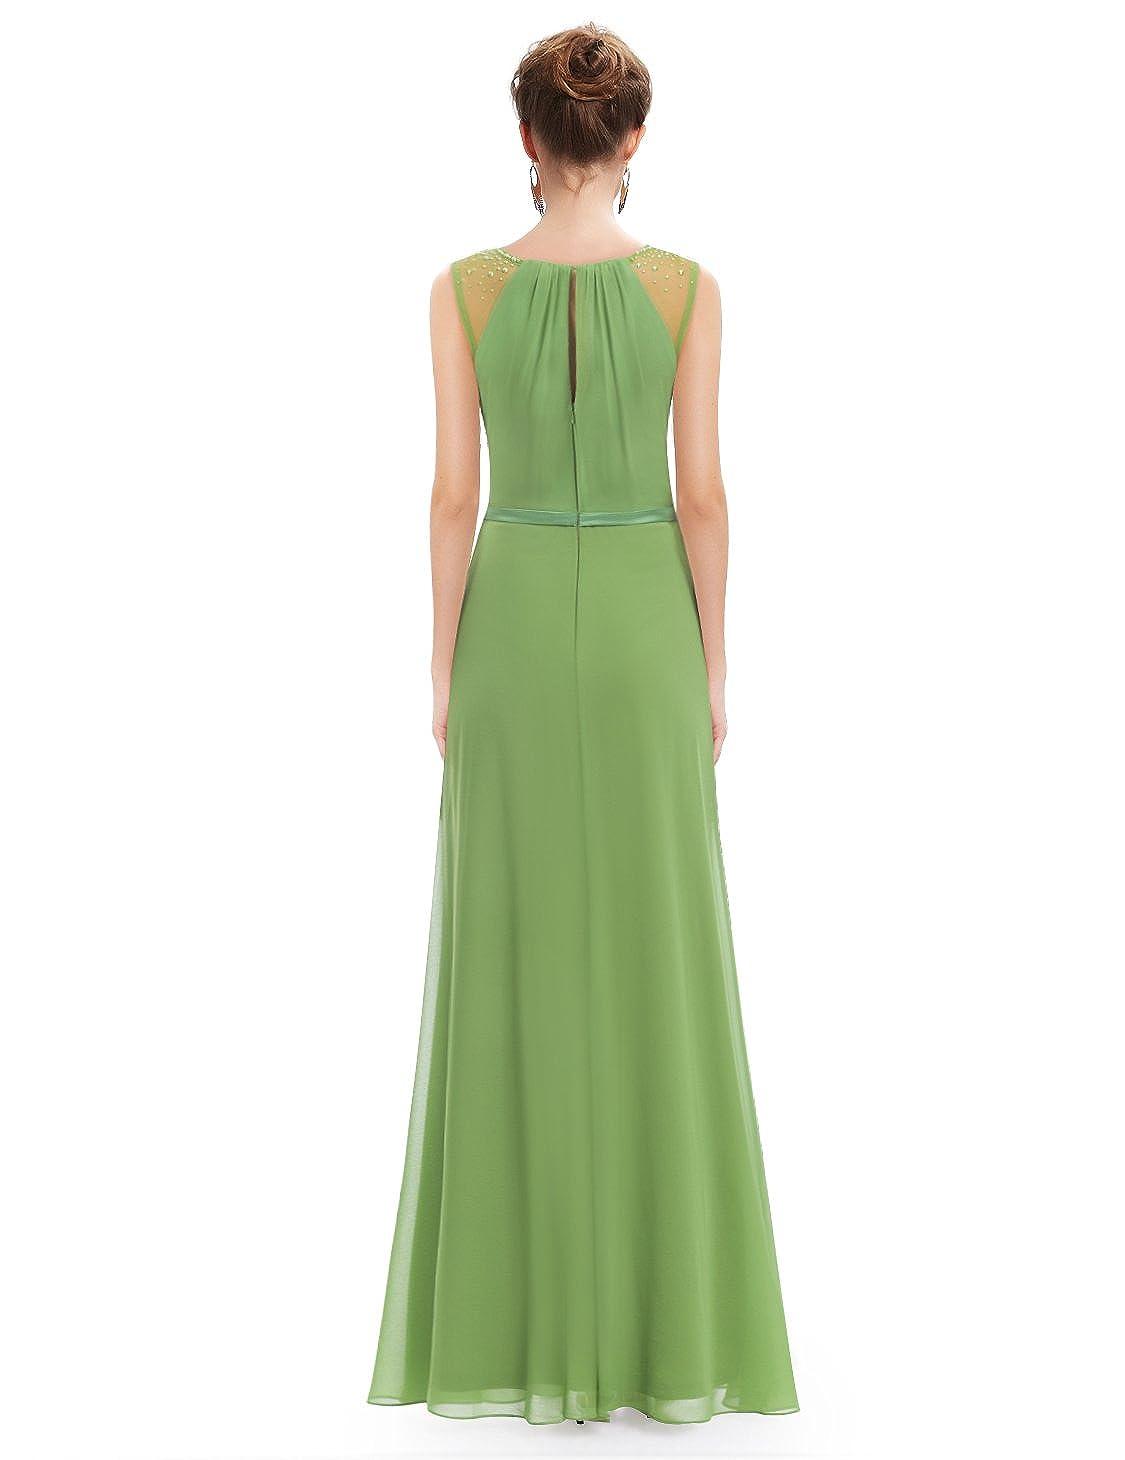 b2f4e5c553c Ever-Pretty Womens Elegant Sleeveless Long Chiffon Bridesmaids Dress 08742  at Amazon Women s Clothing store